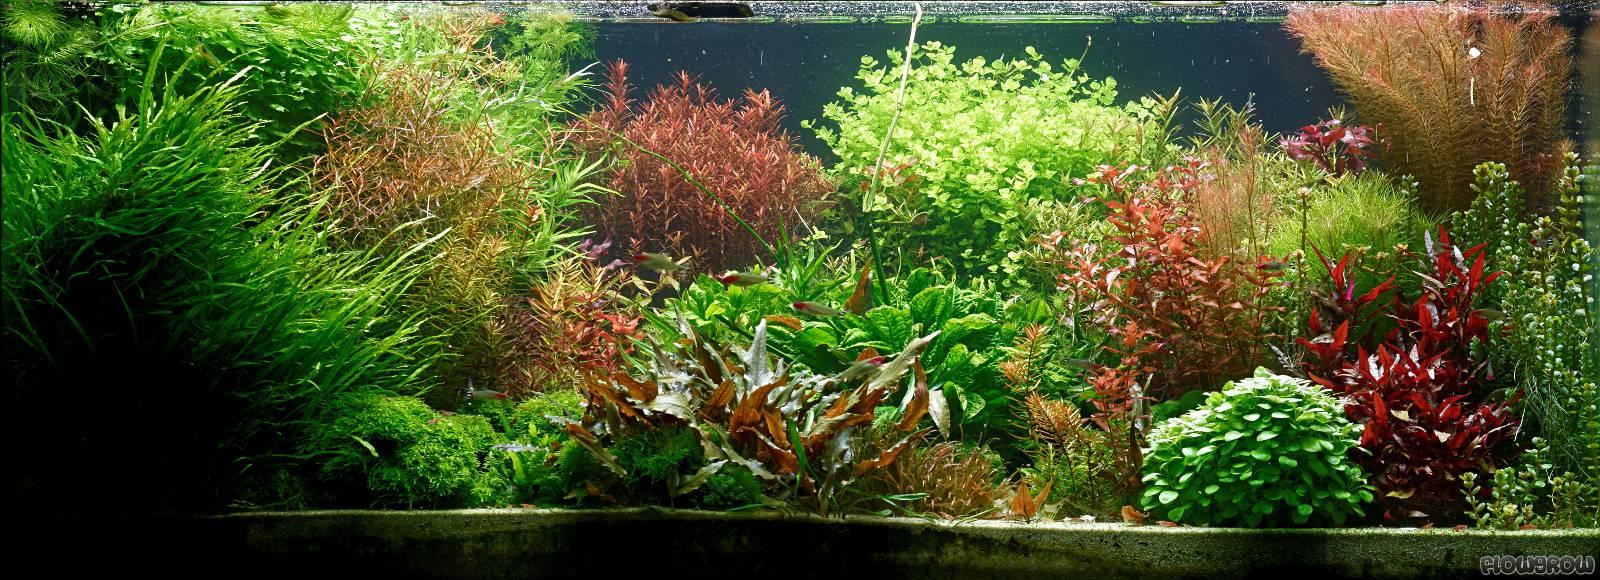 innenfilter technik aquascaping aquarium wasserpflanzen flowgrow. Black Bedroom Furniture Sets. Home Design Ideas